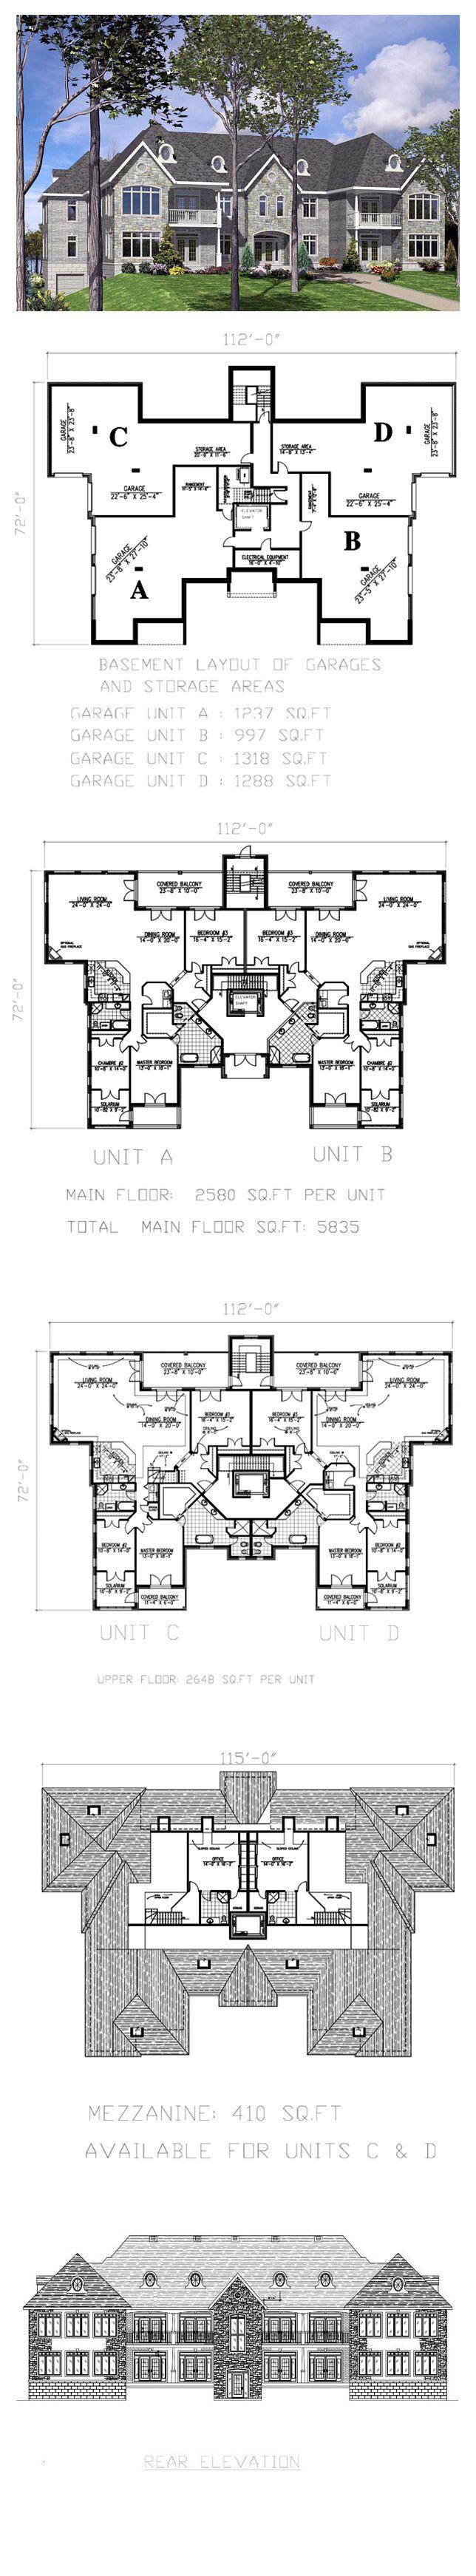 125 best images about duplex apartment plans on for Multi living house plans